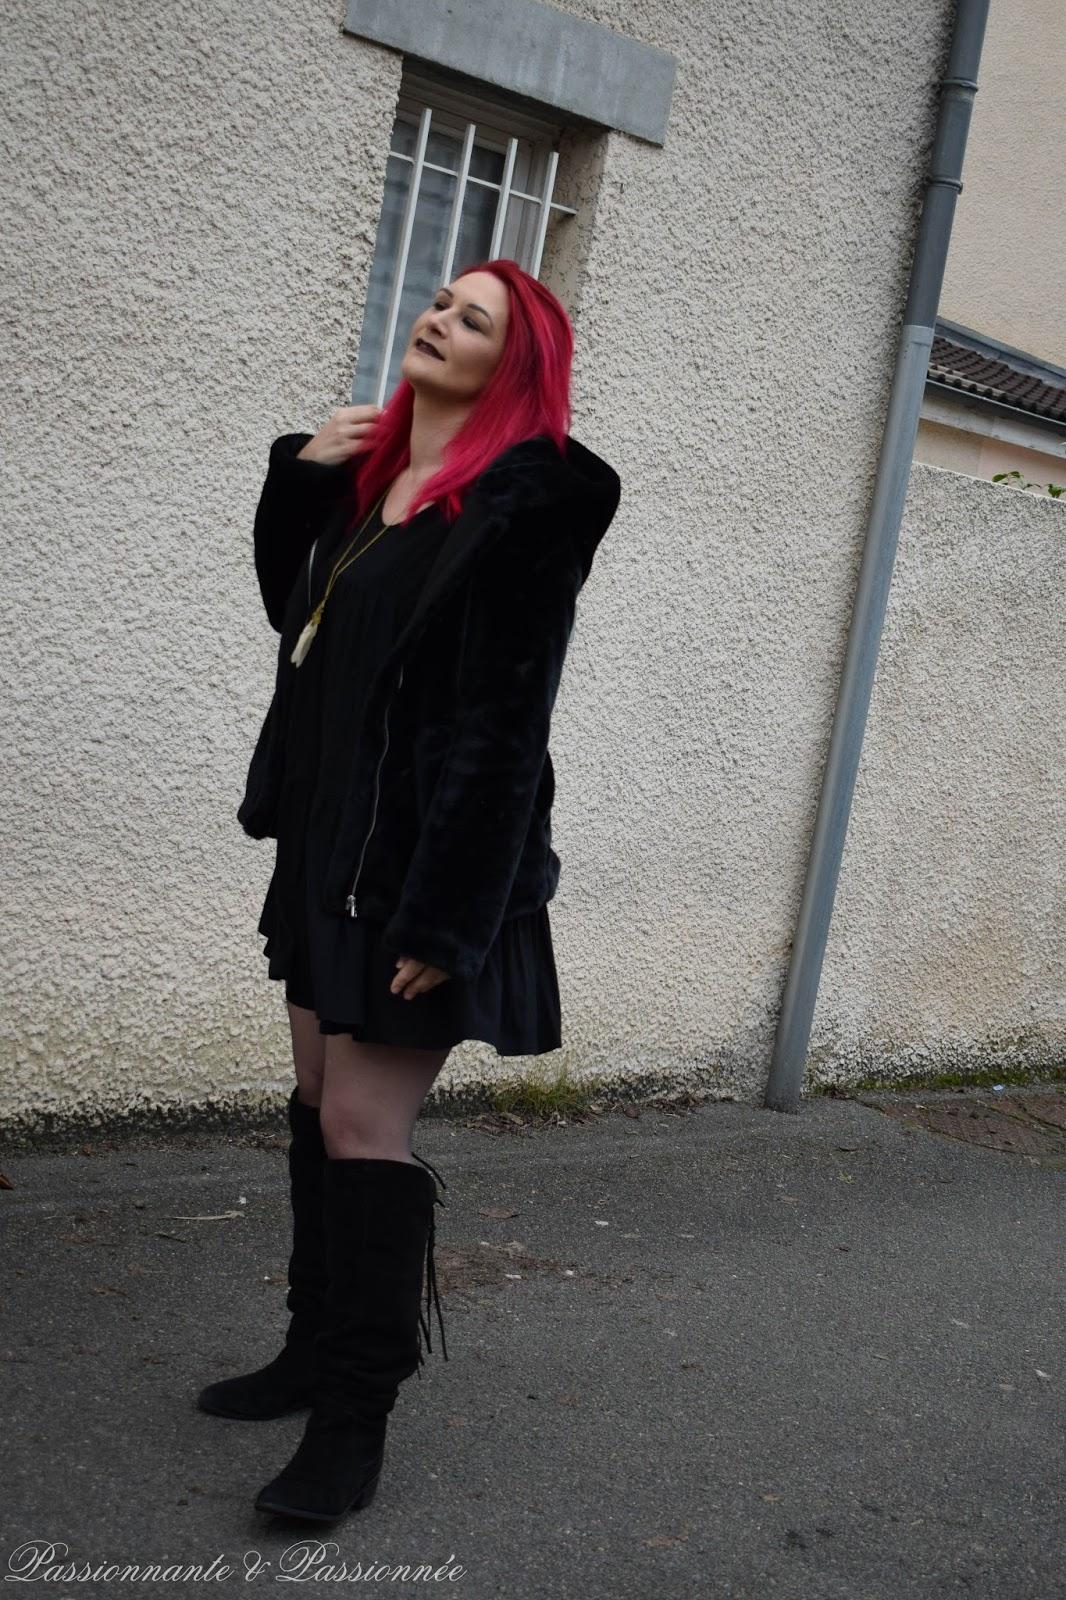 j'ai les cheveux rose